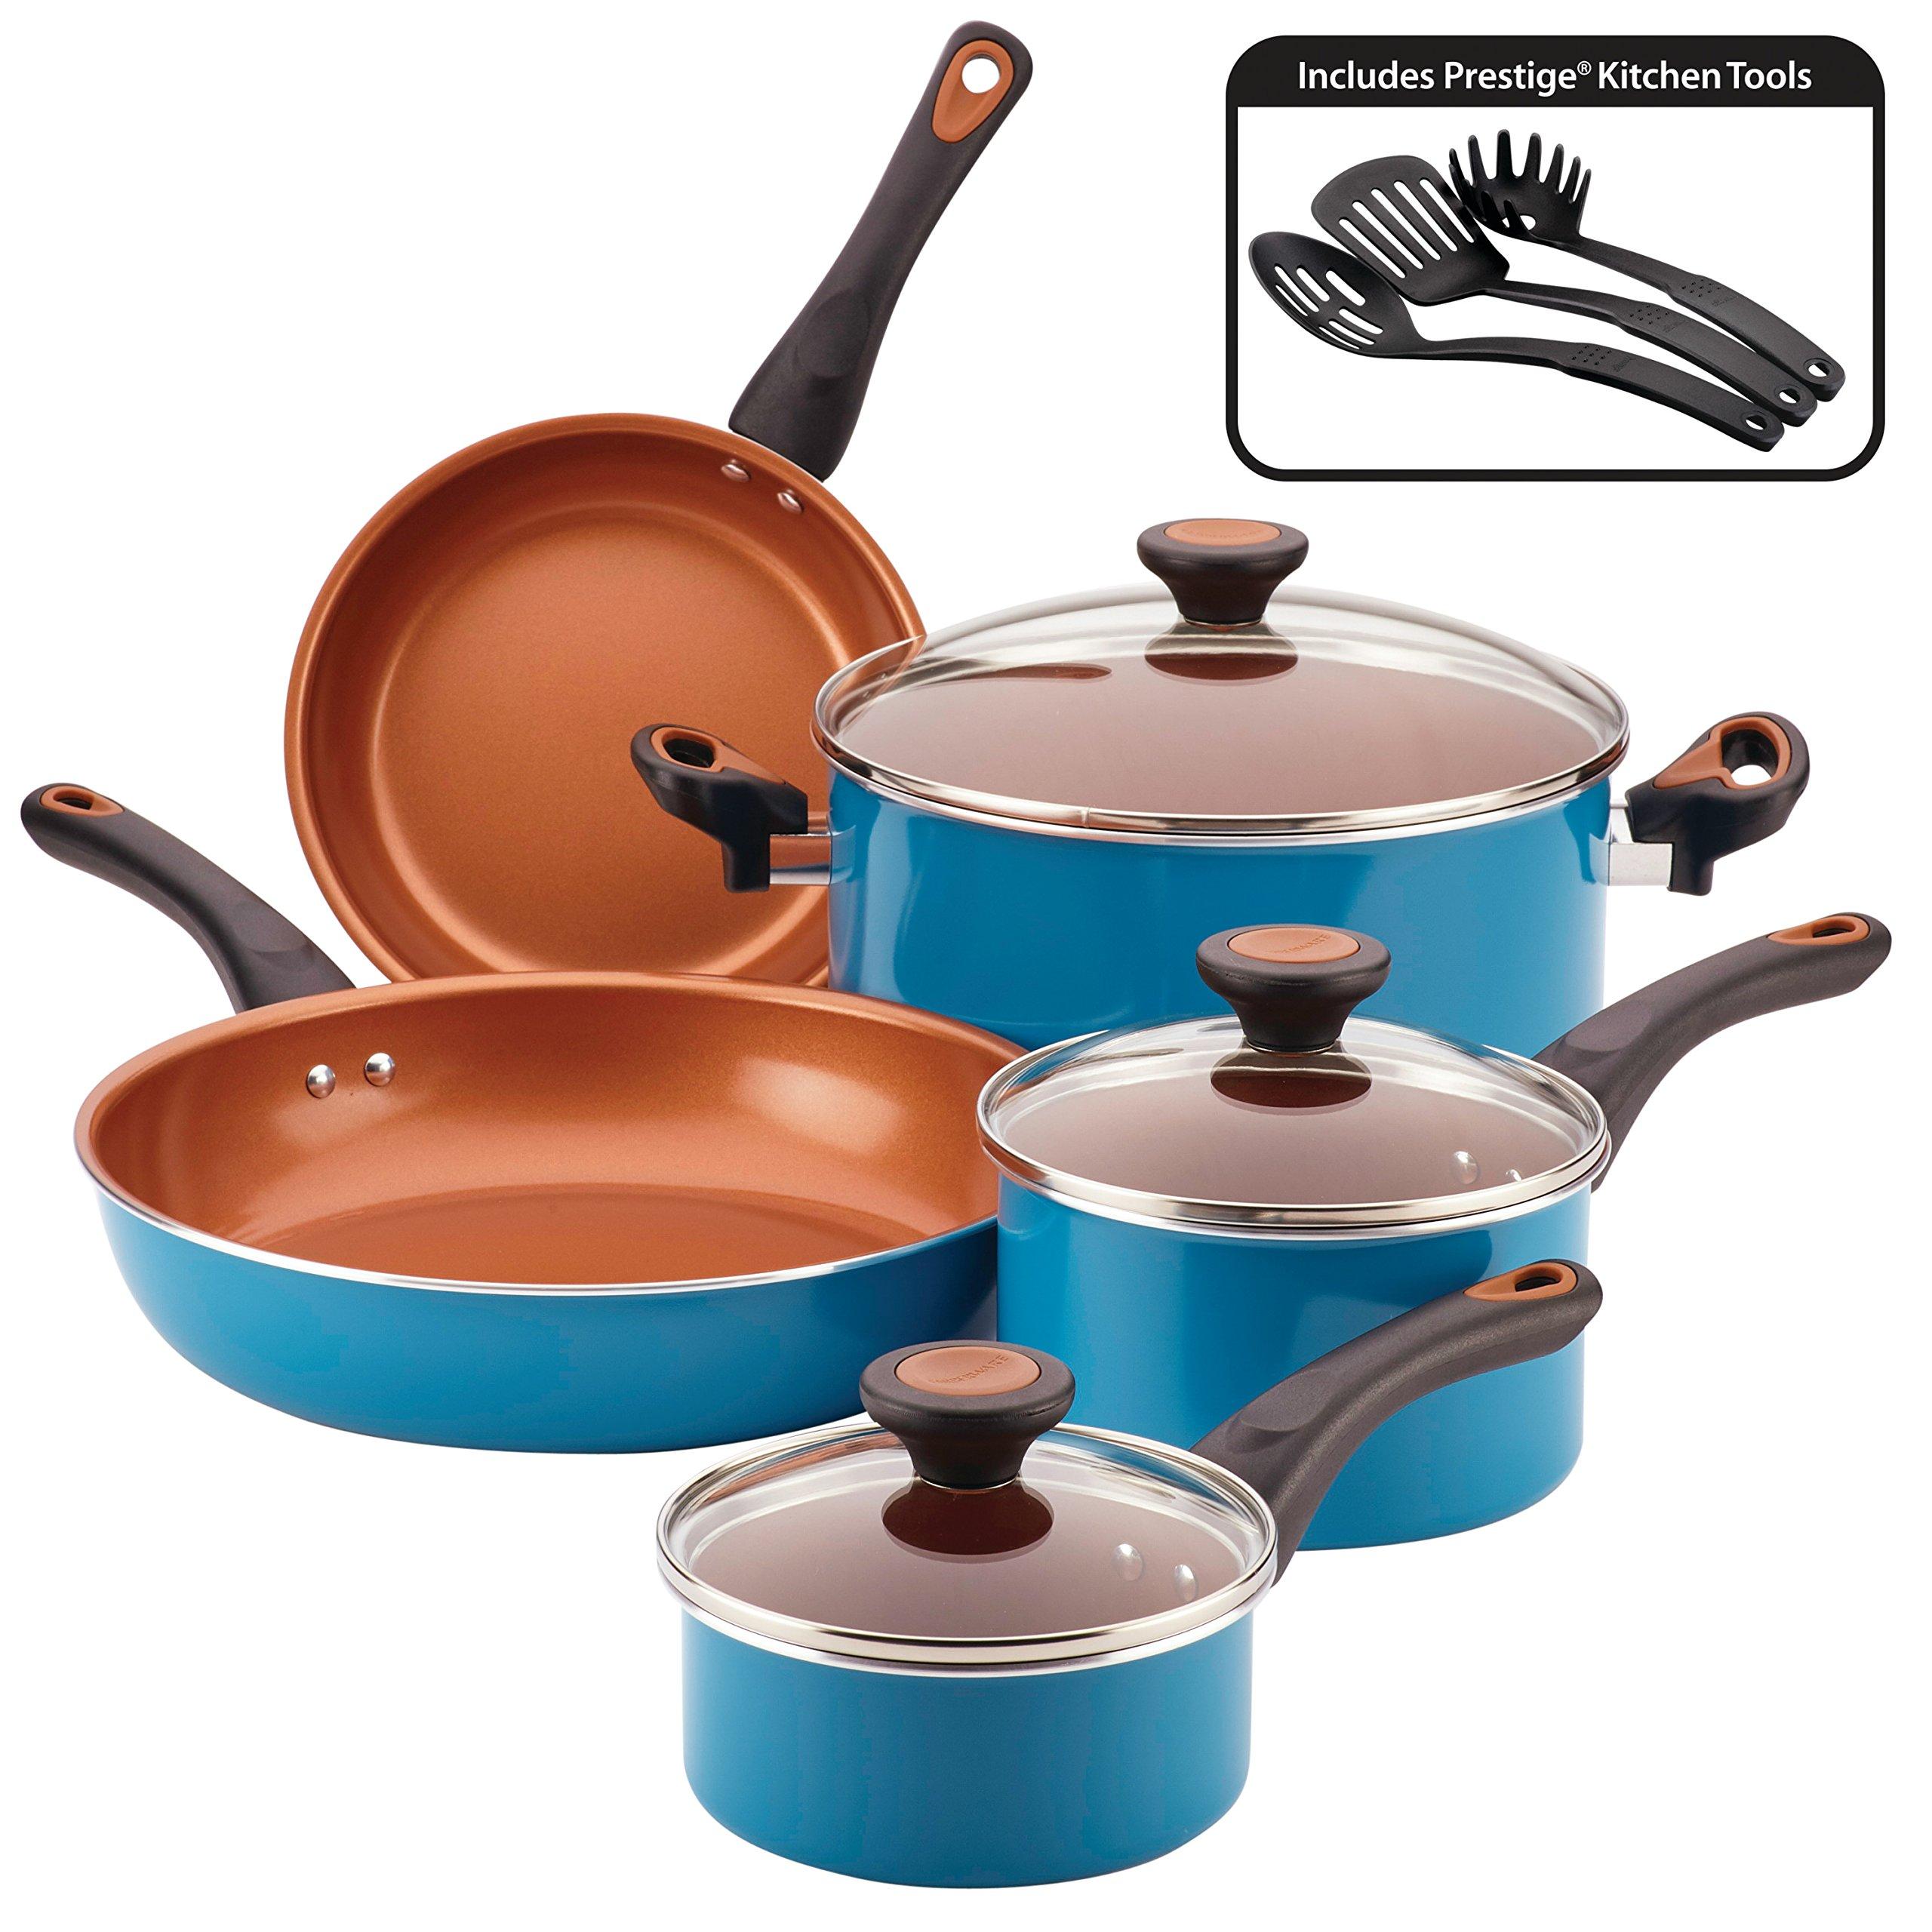 Farberware 10366 Glide Cookware Set, 11 Piece, Teal